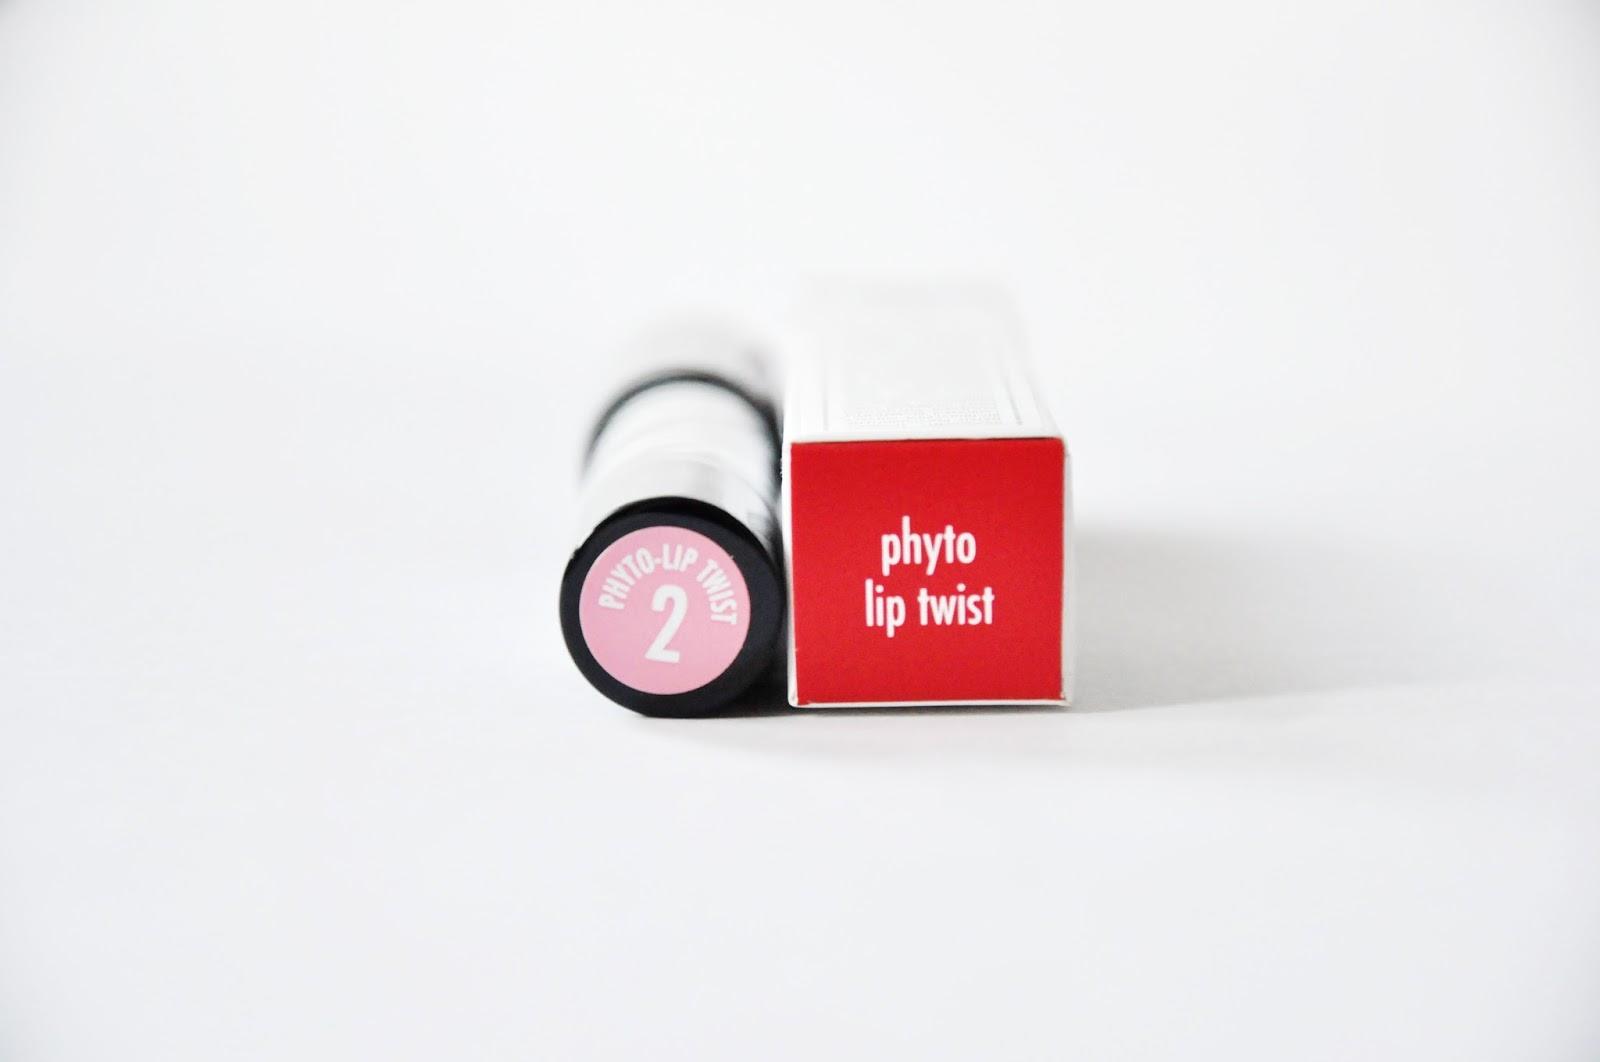 SISLEY Phyto Lip Twist Tinted Balm #2